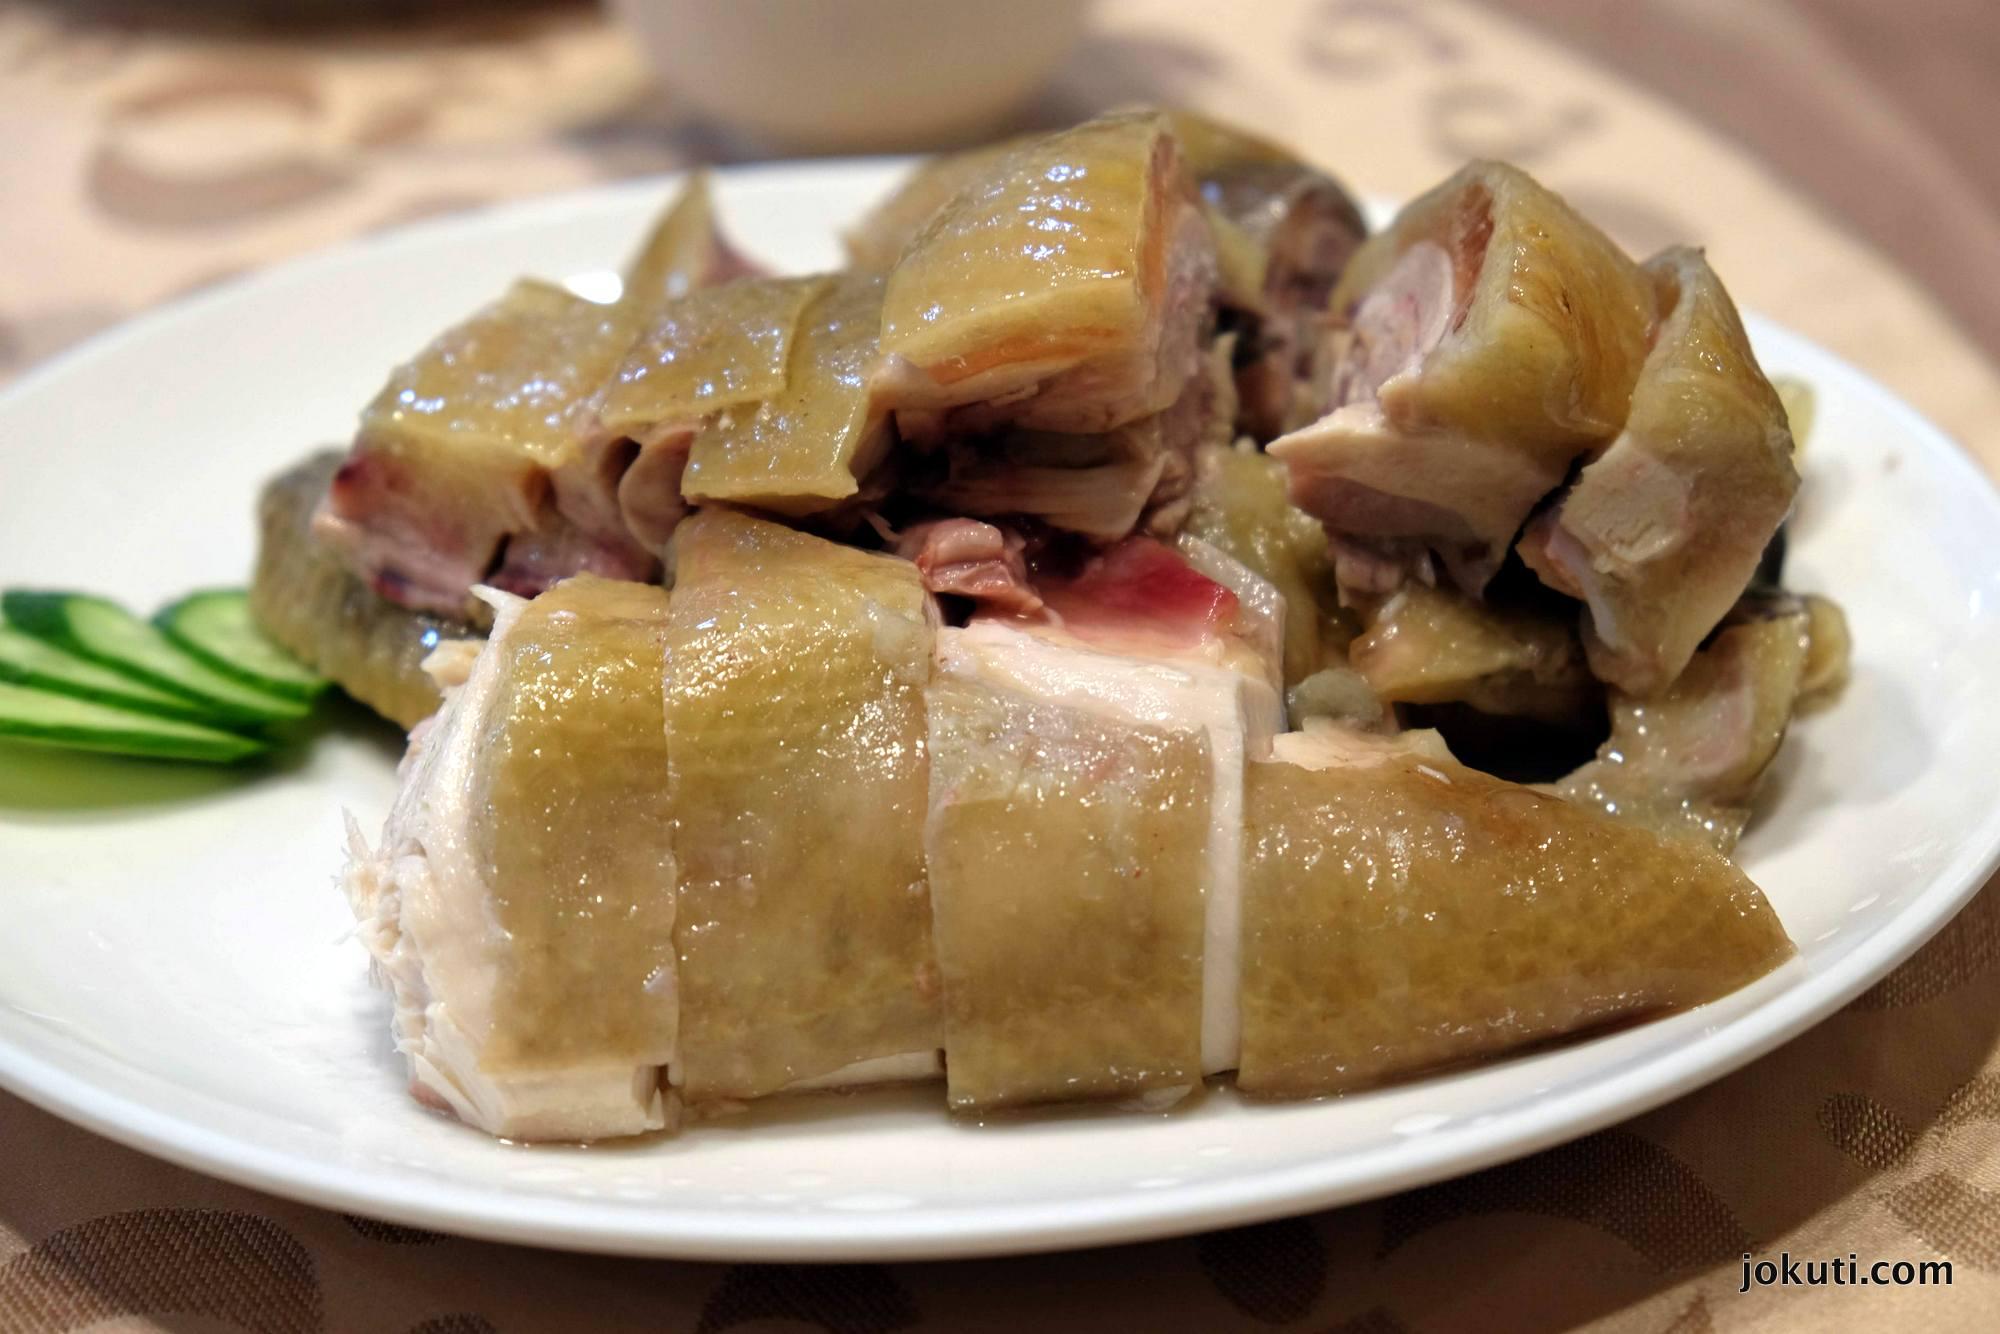 dscf2889_taipei_ming_fu_seafood_michelin_taiwan_vilagevo_jokuti.jpg